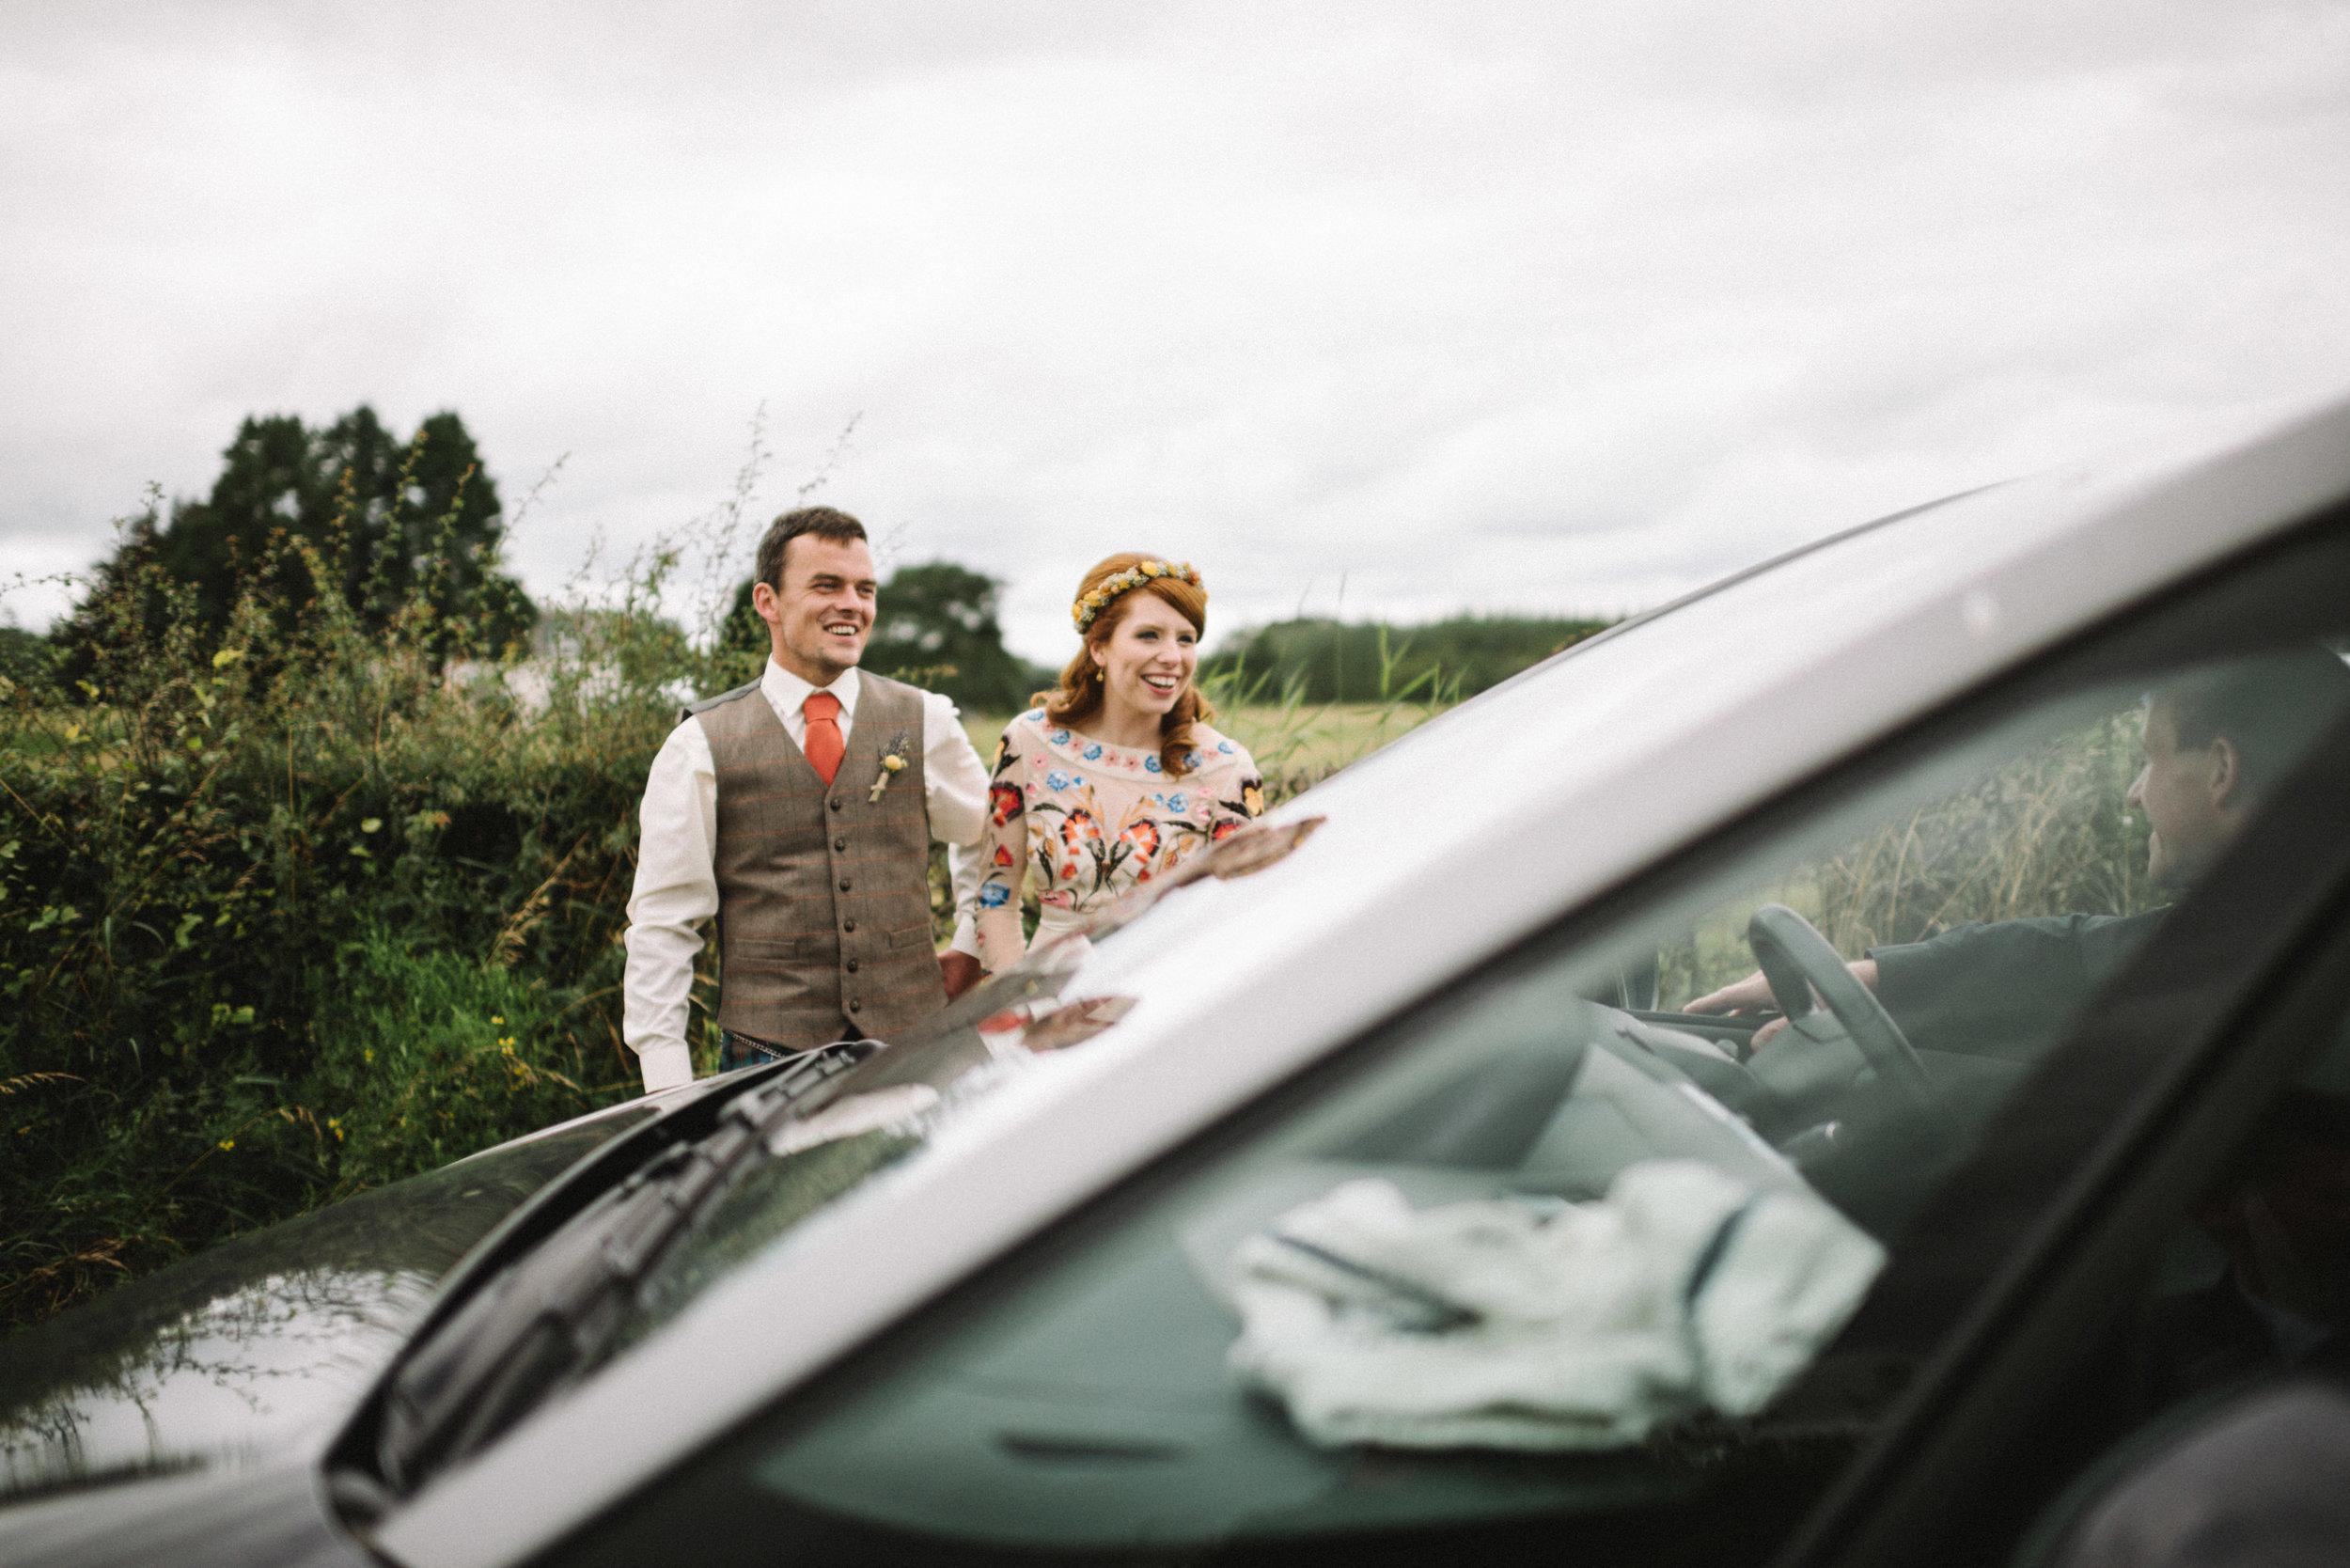 0190-alternative-wedding-portrait-family-kids-photographer-glasgow-scotland.JPG